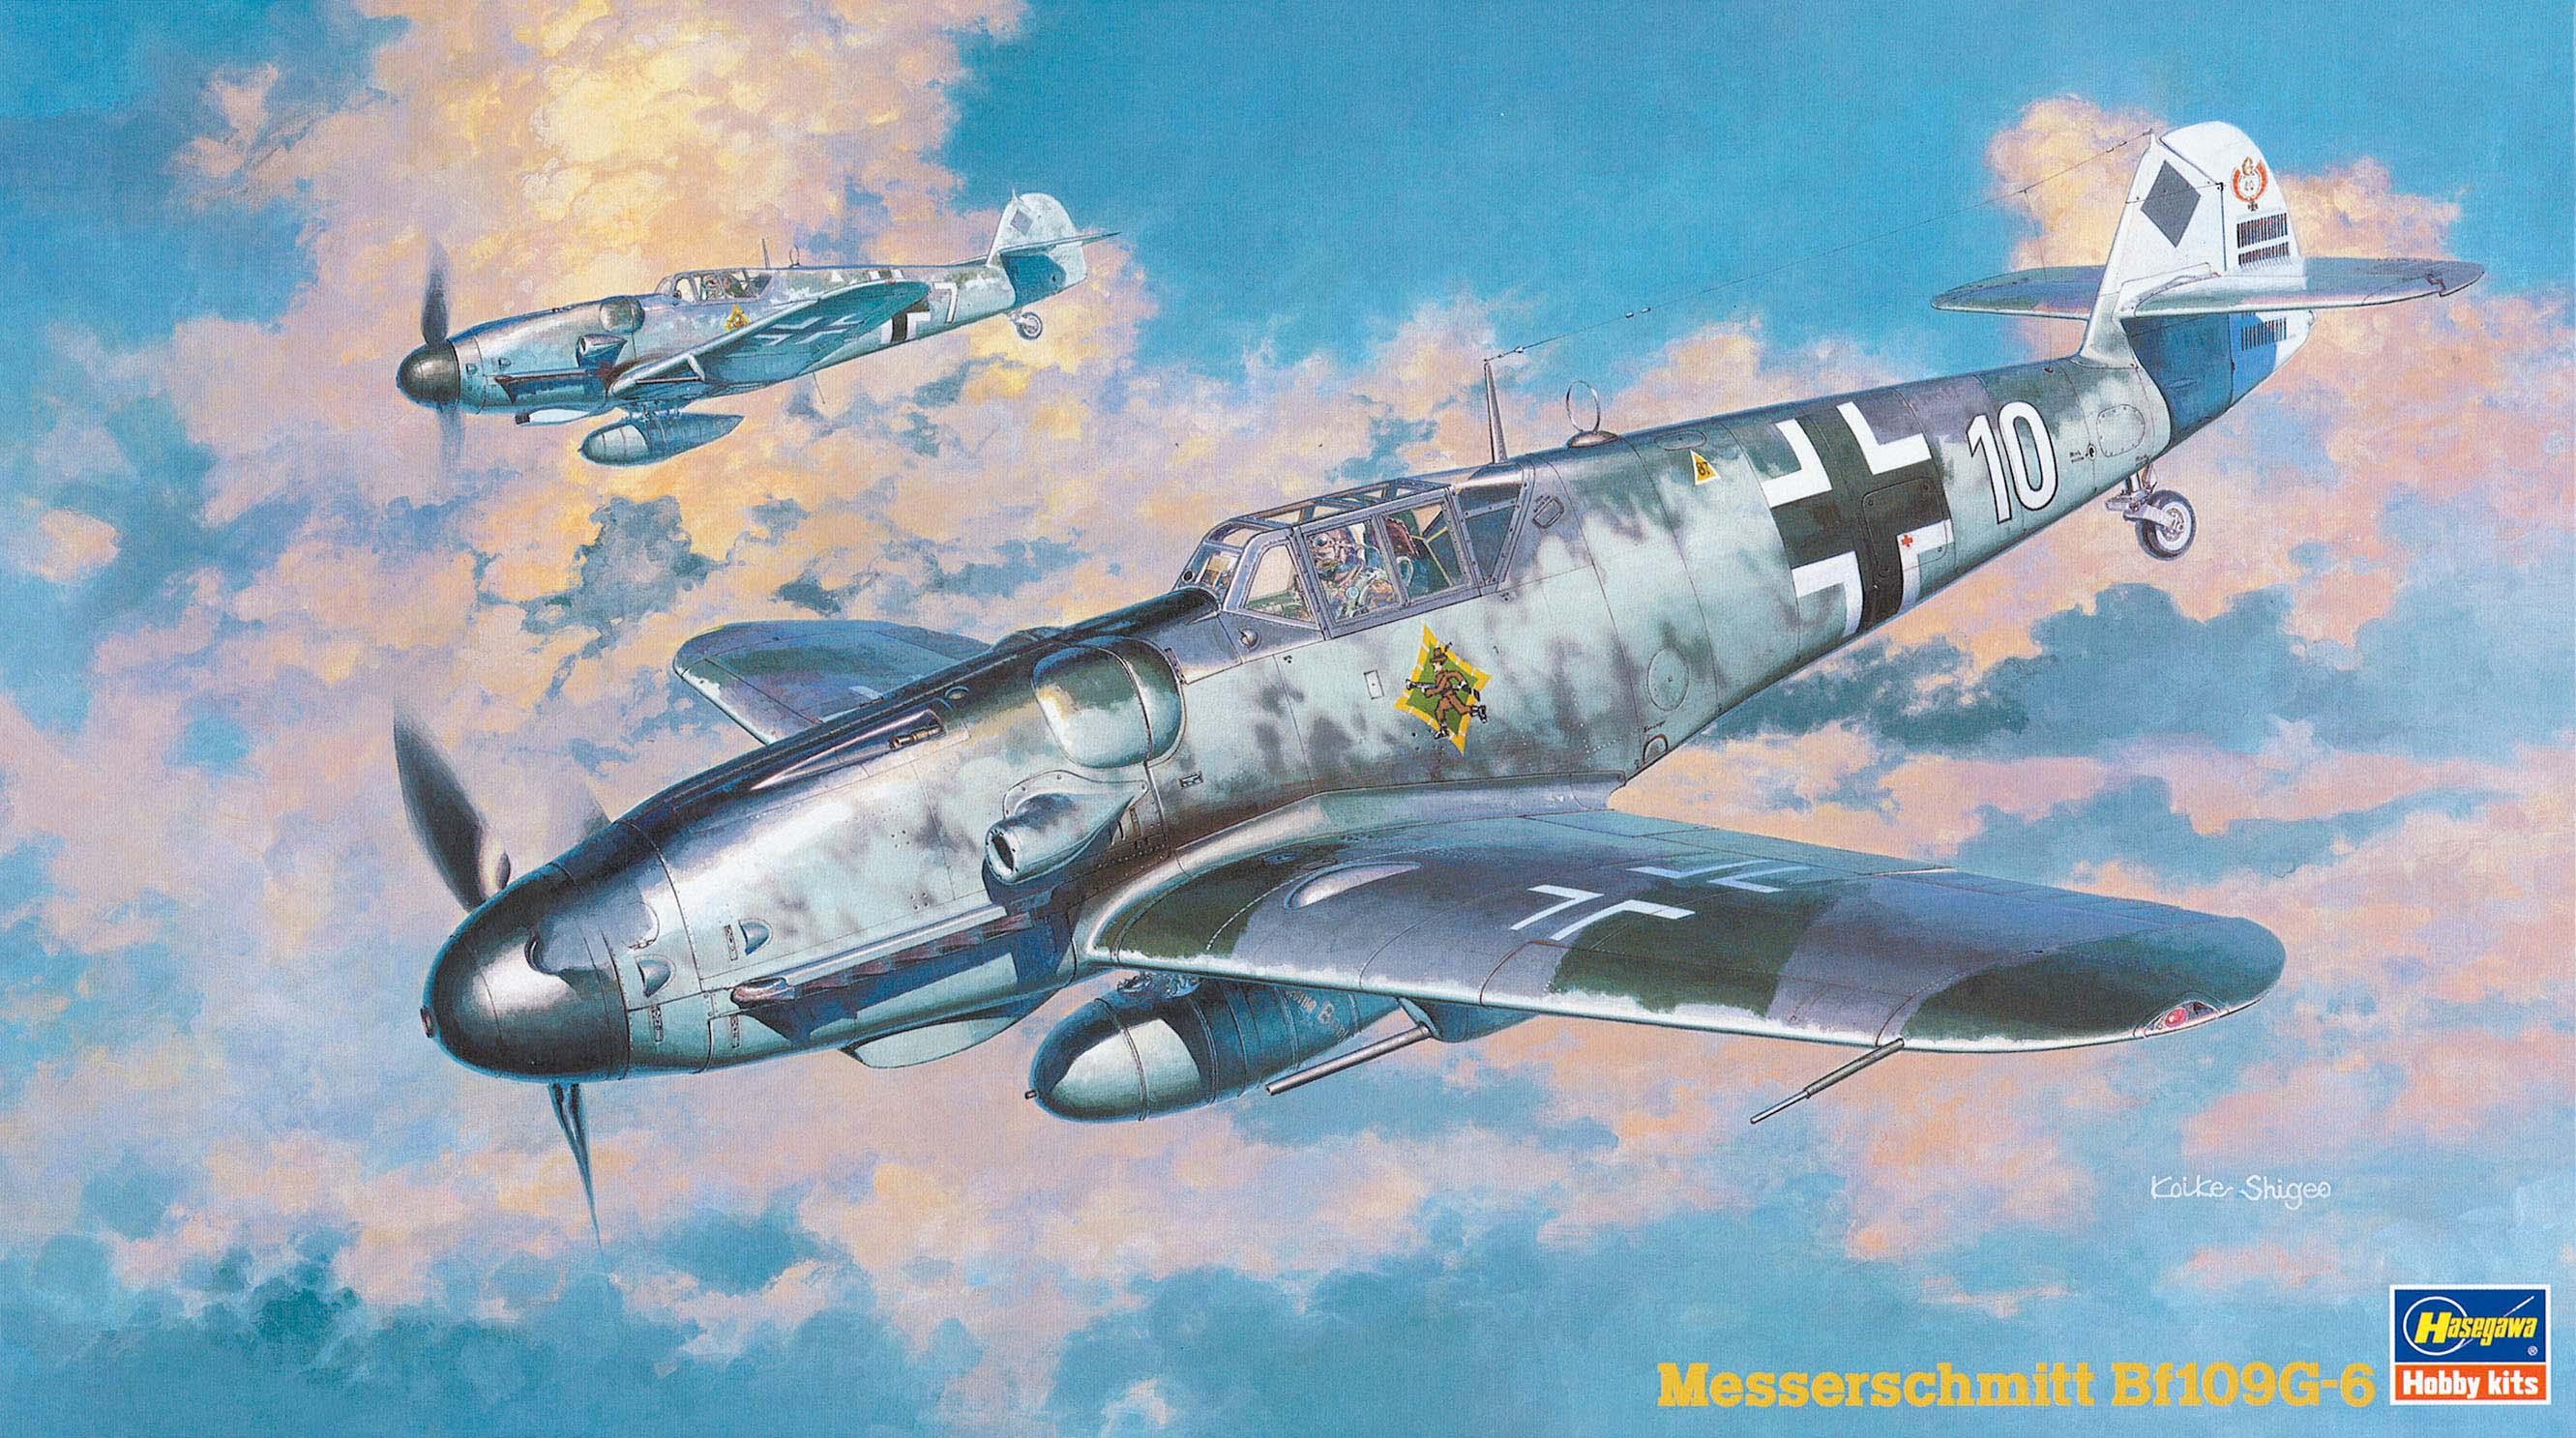 Hasegawa 1/48 BF109G-6